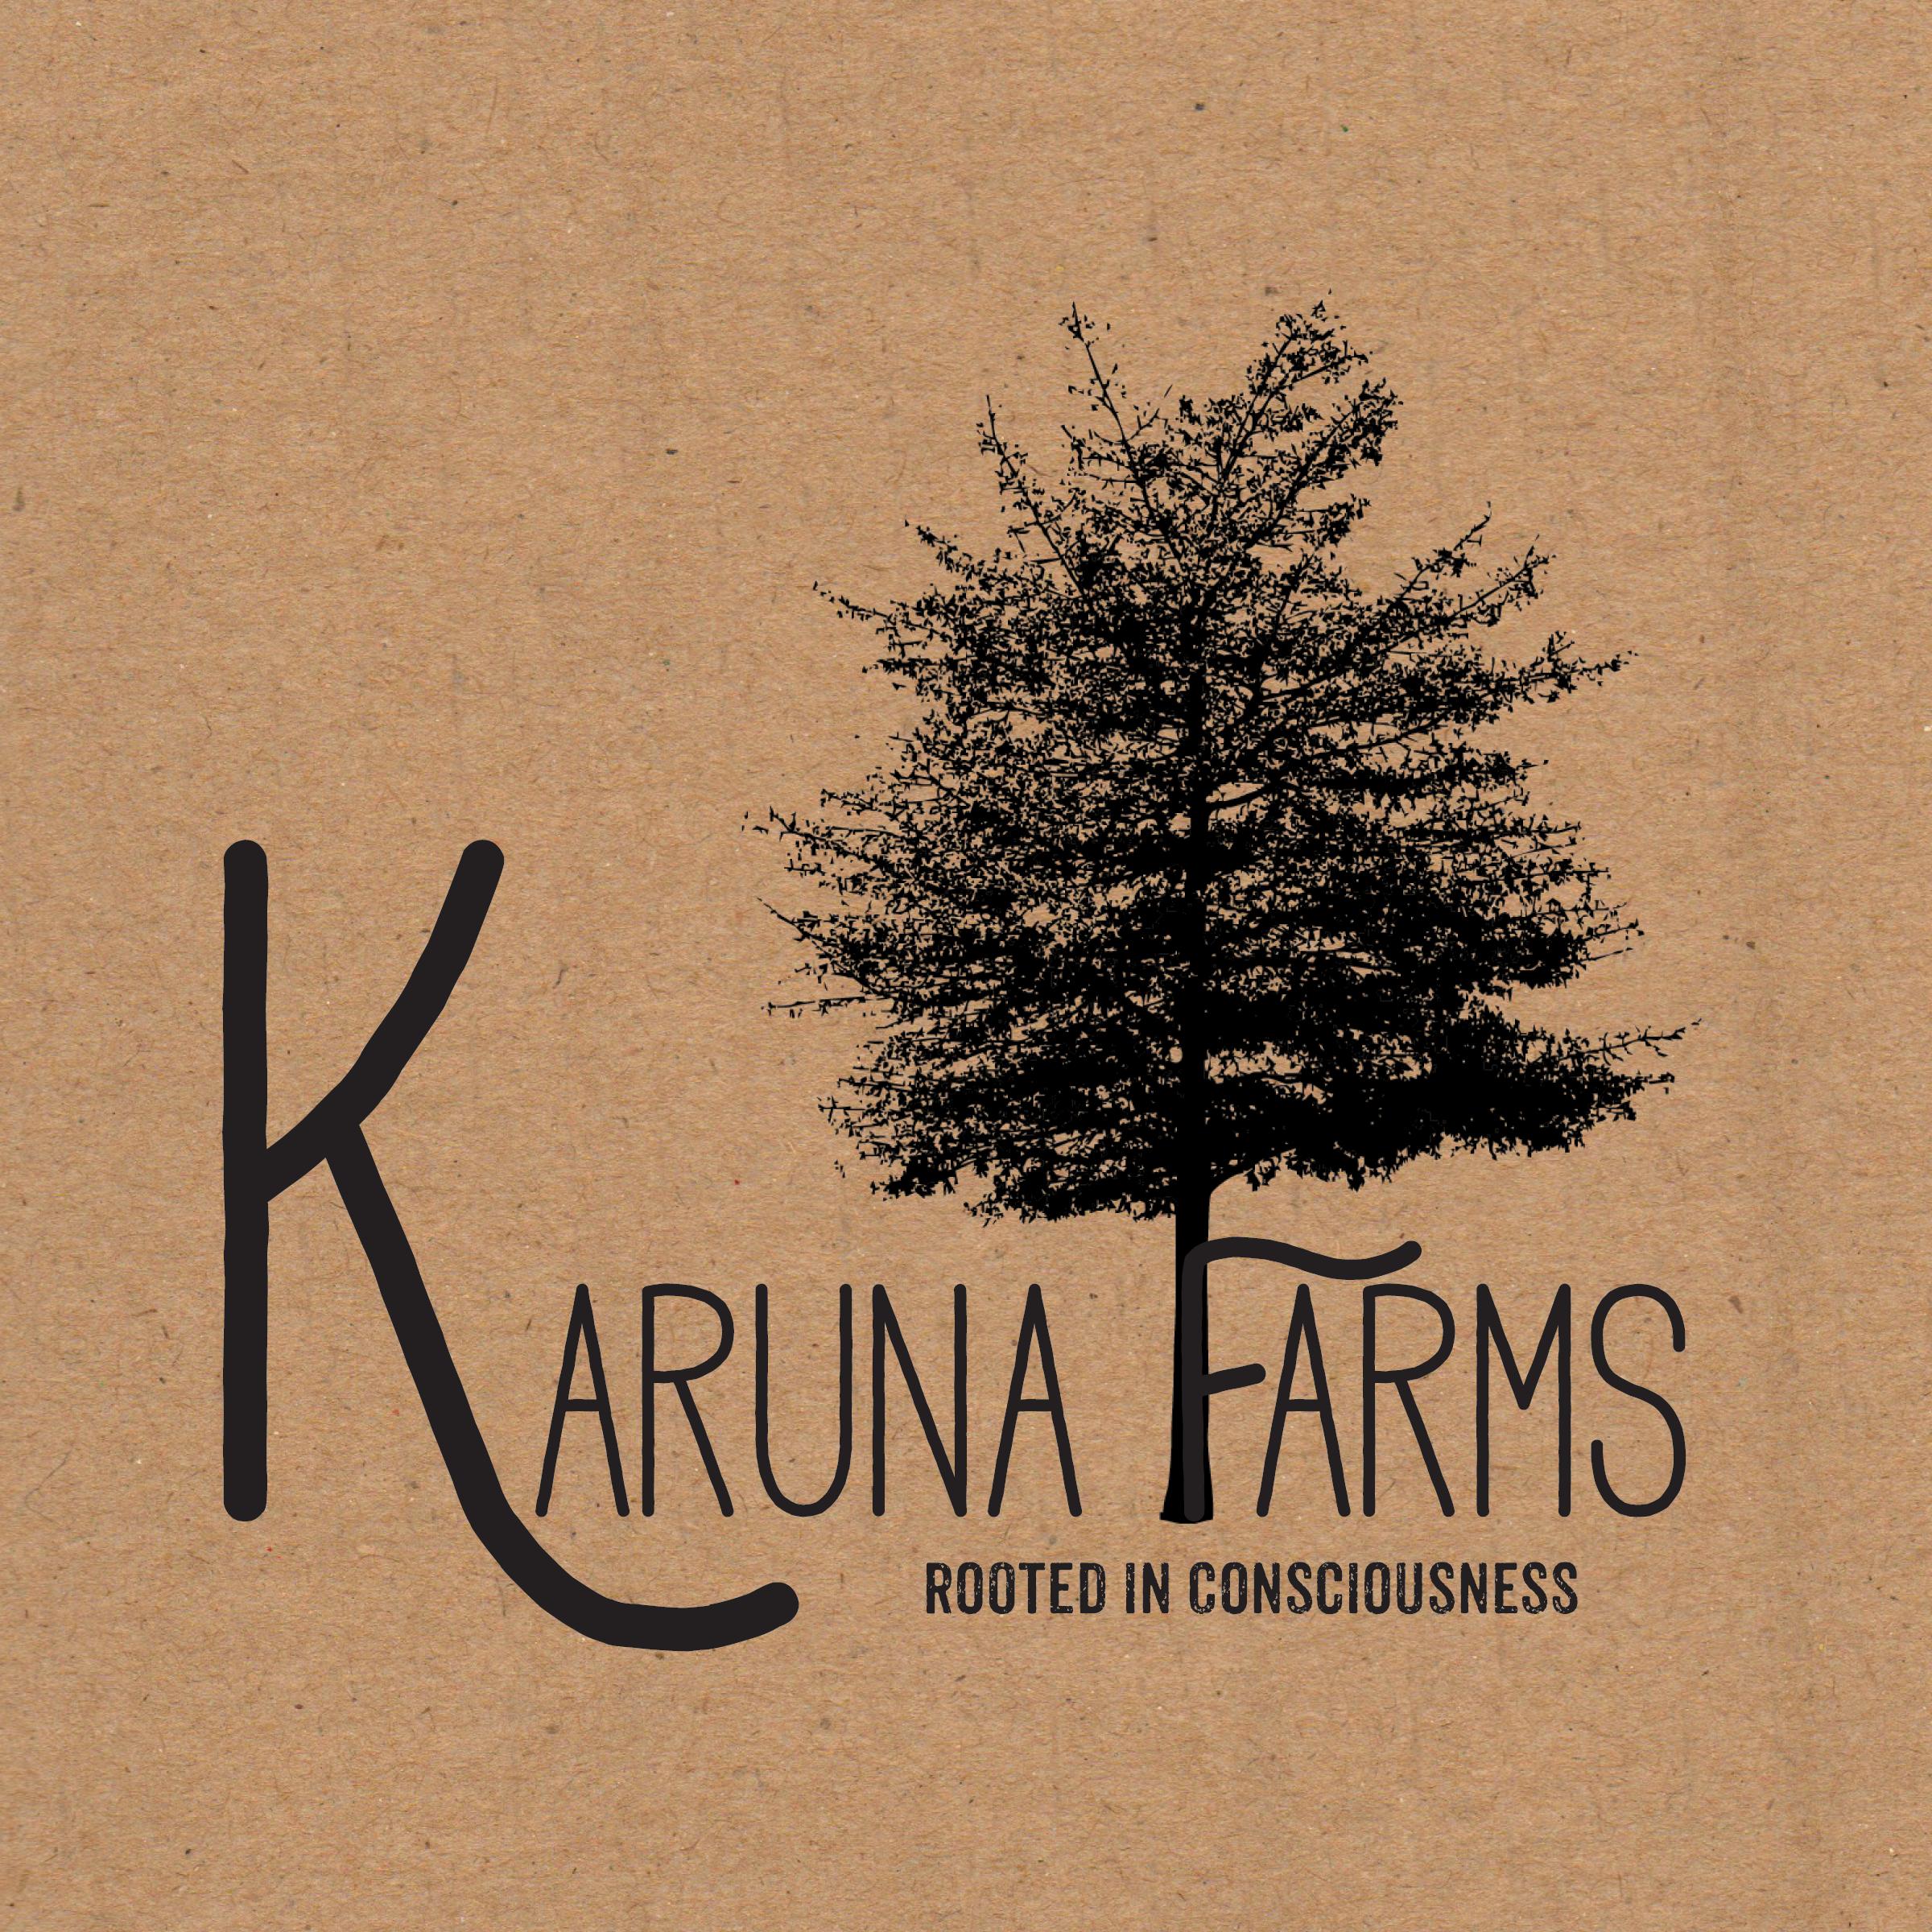 Karuna-Farms-Logo-2-3.png